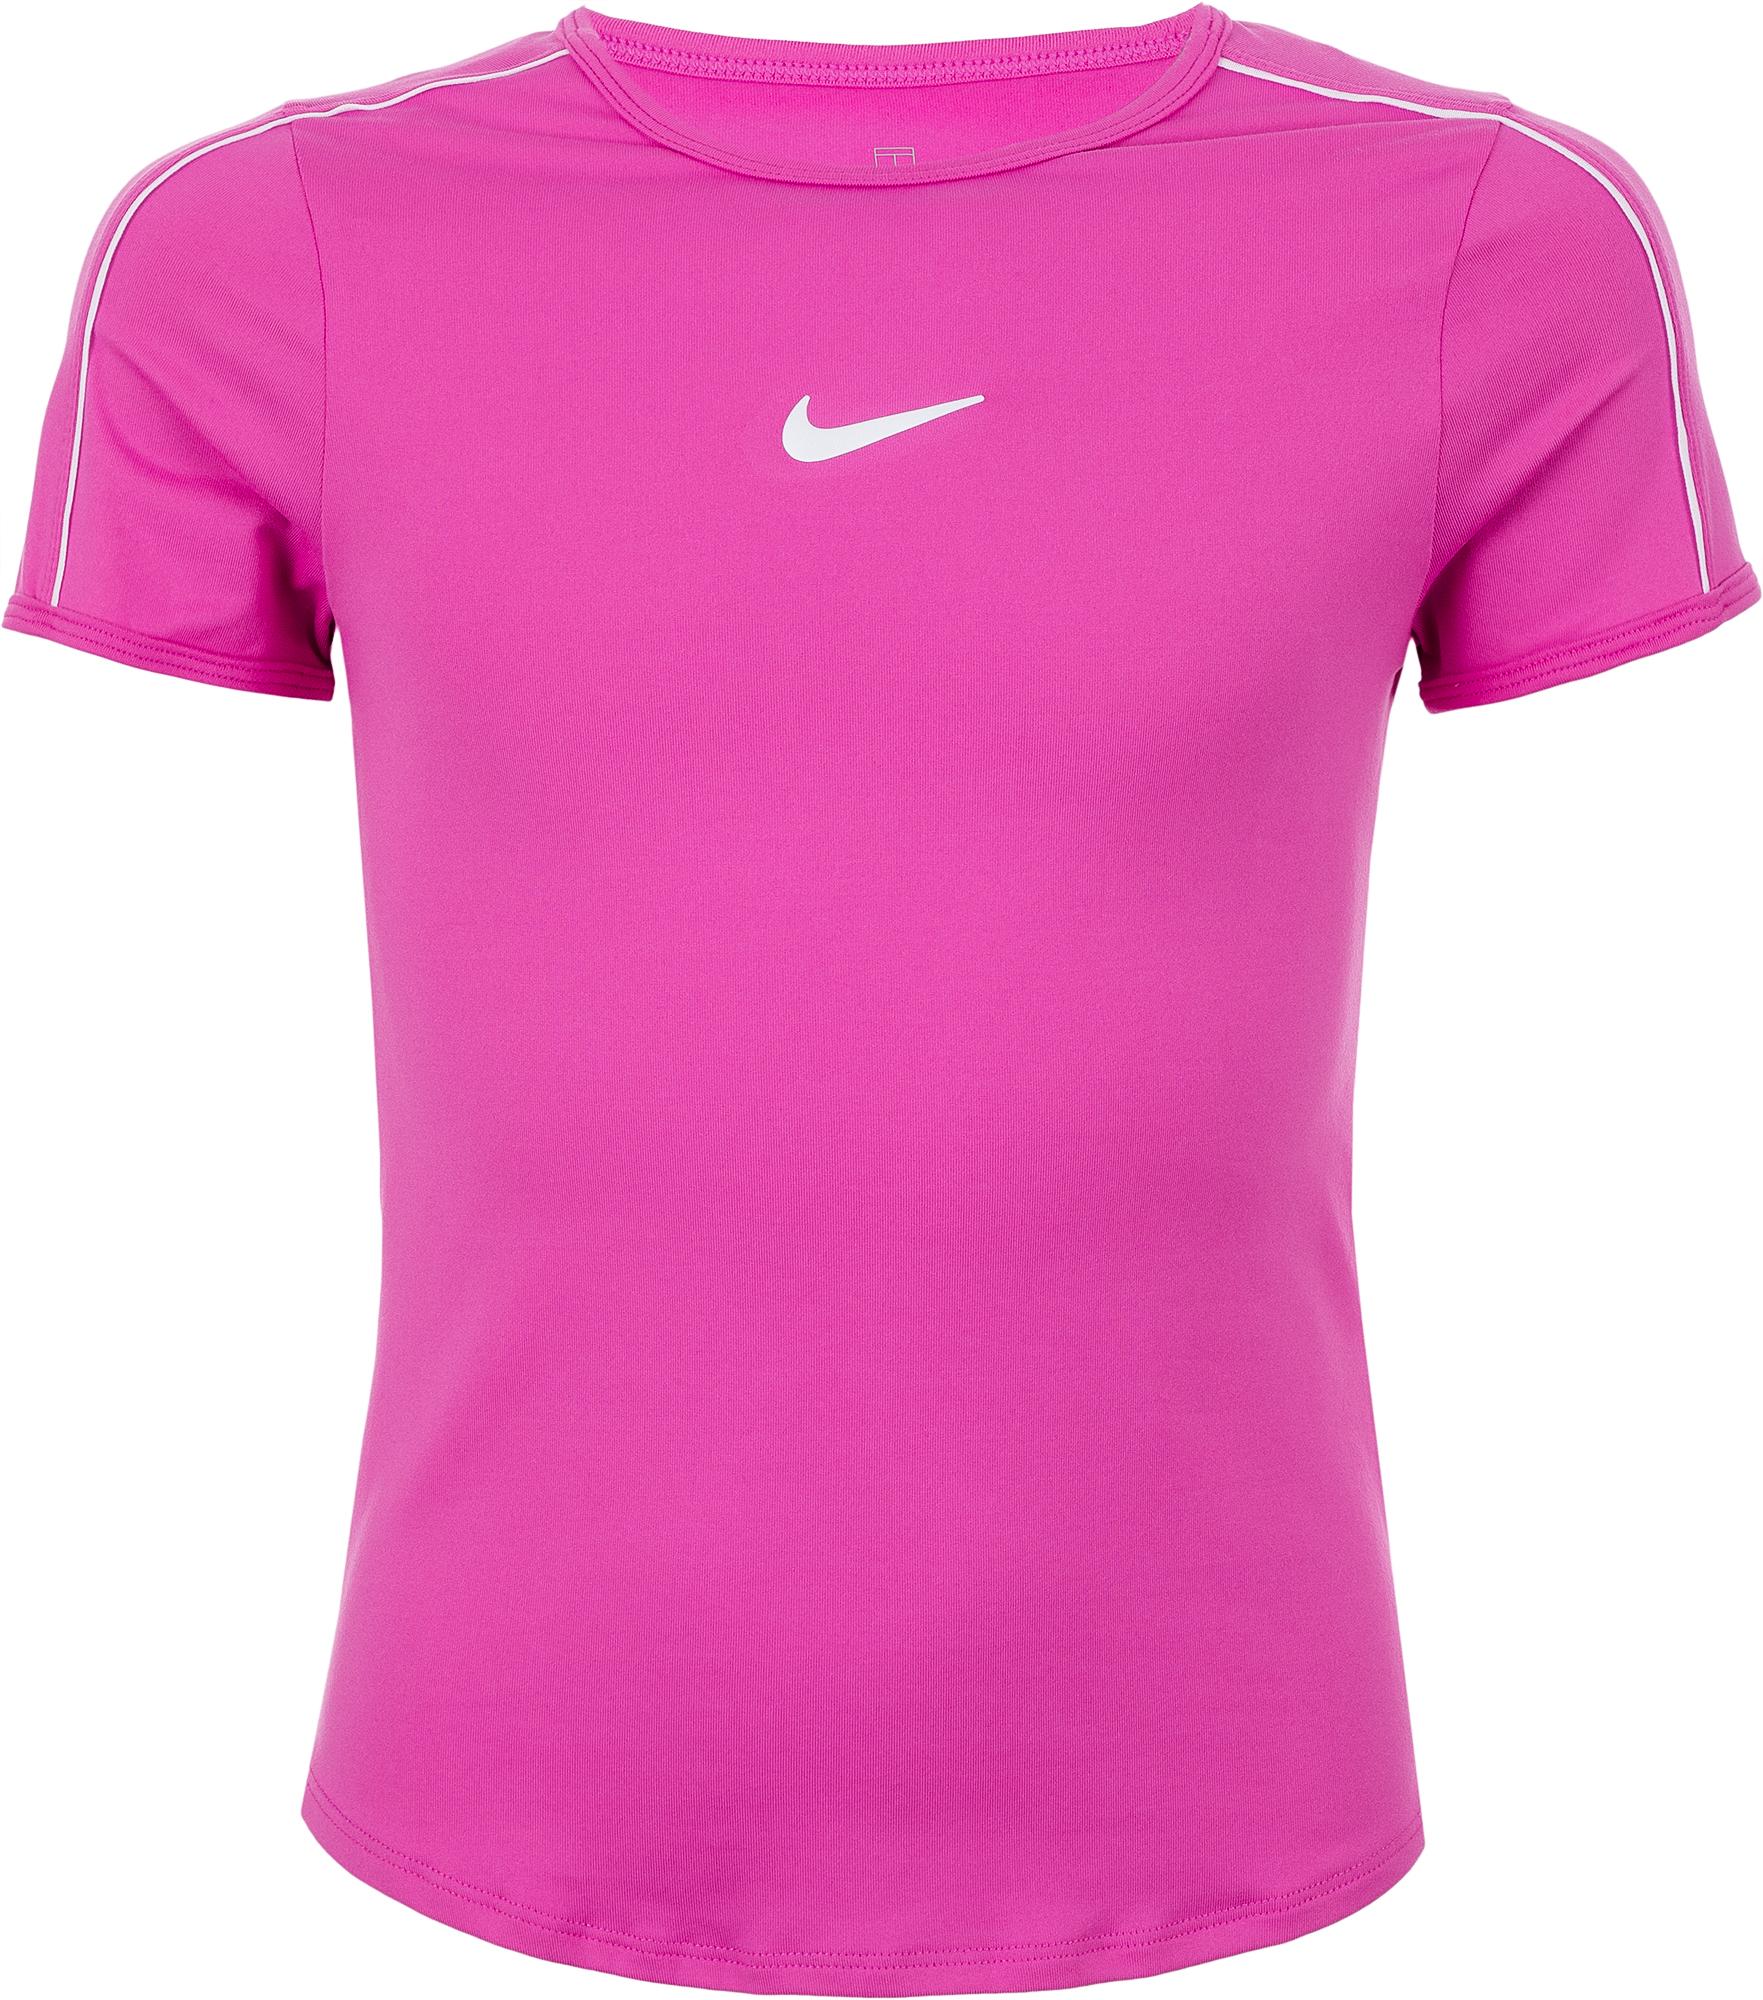 Nike Футболка для девочек  Court Dri-FIT, размер 156-164